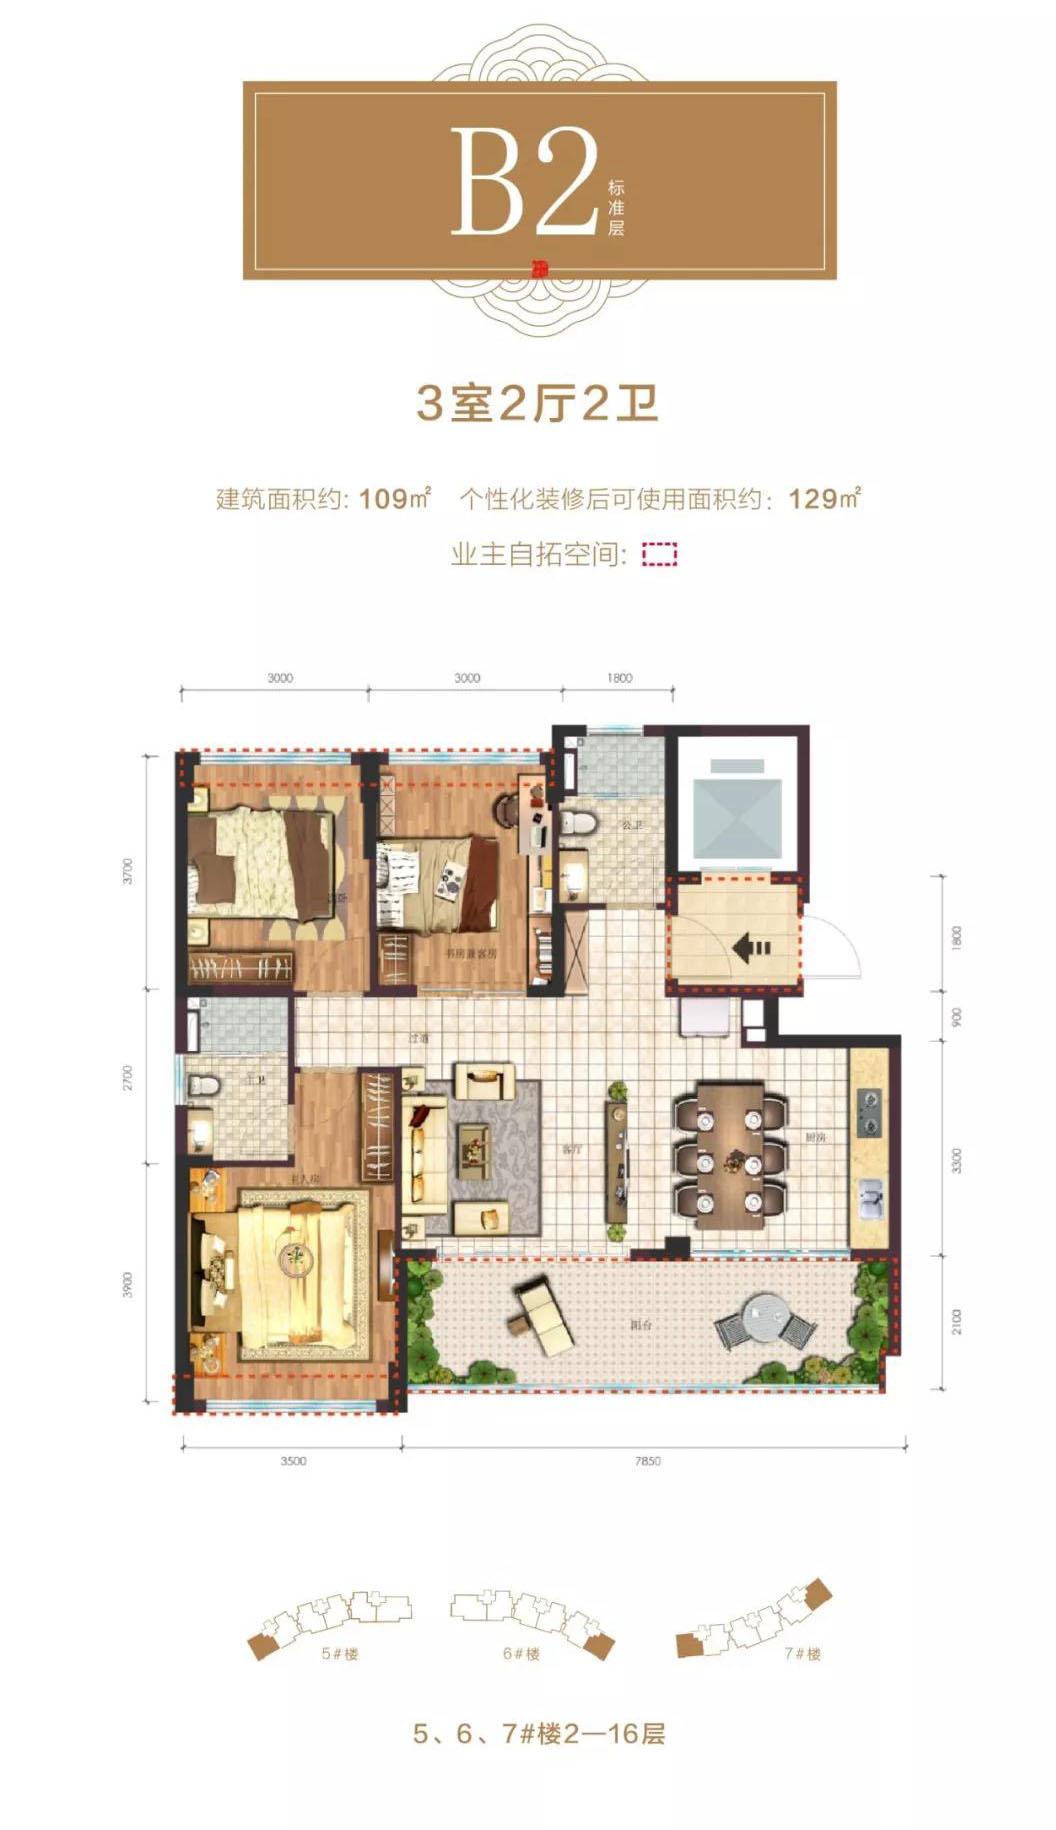 B2标准层建面约109㎡3室2厅2卫